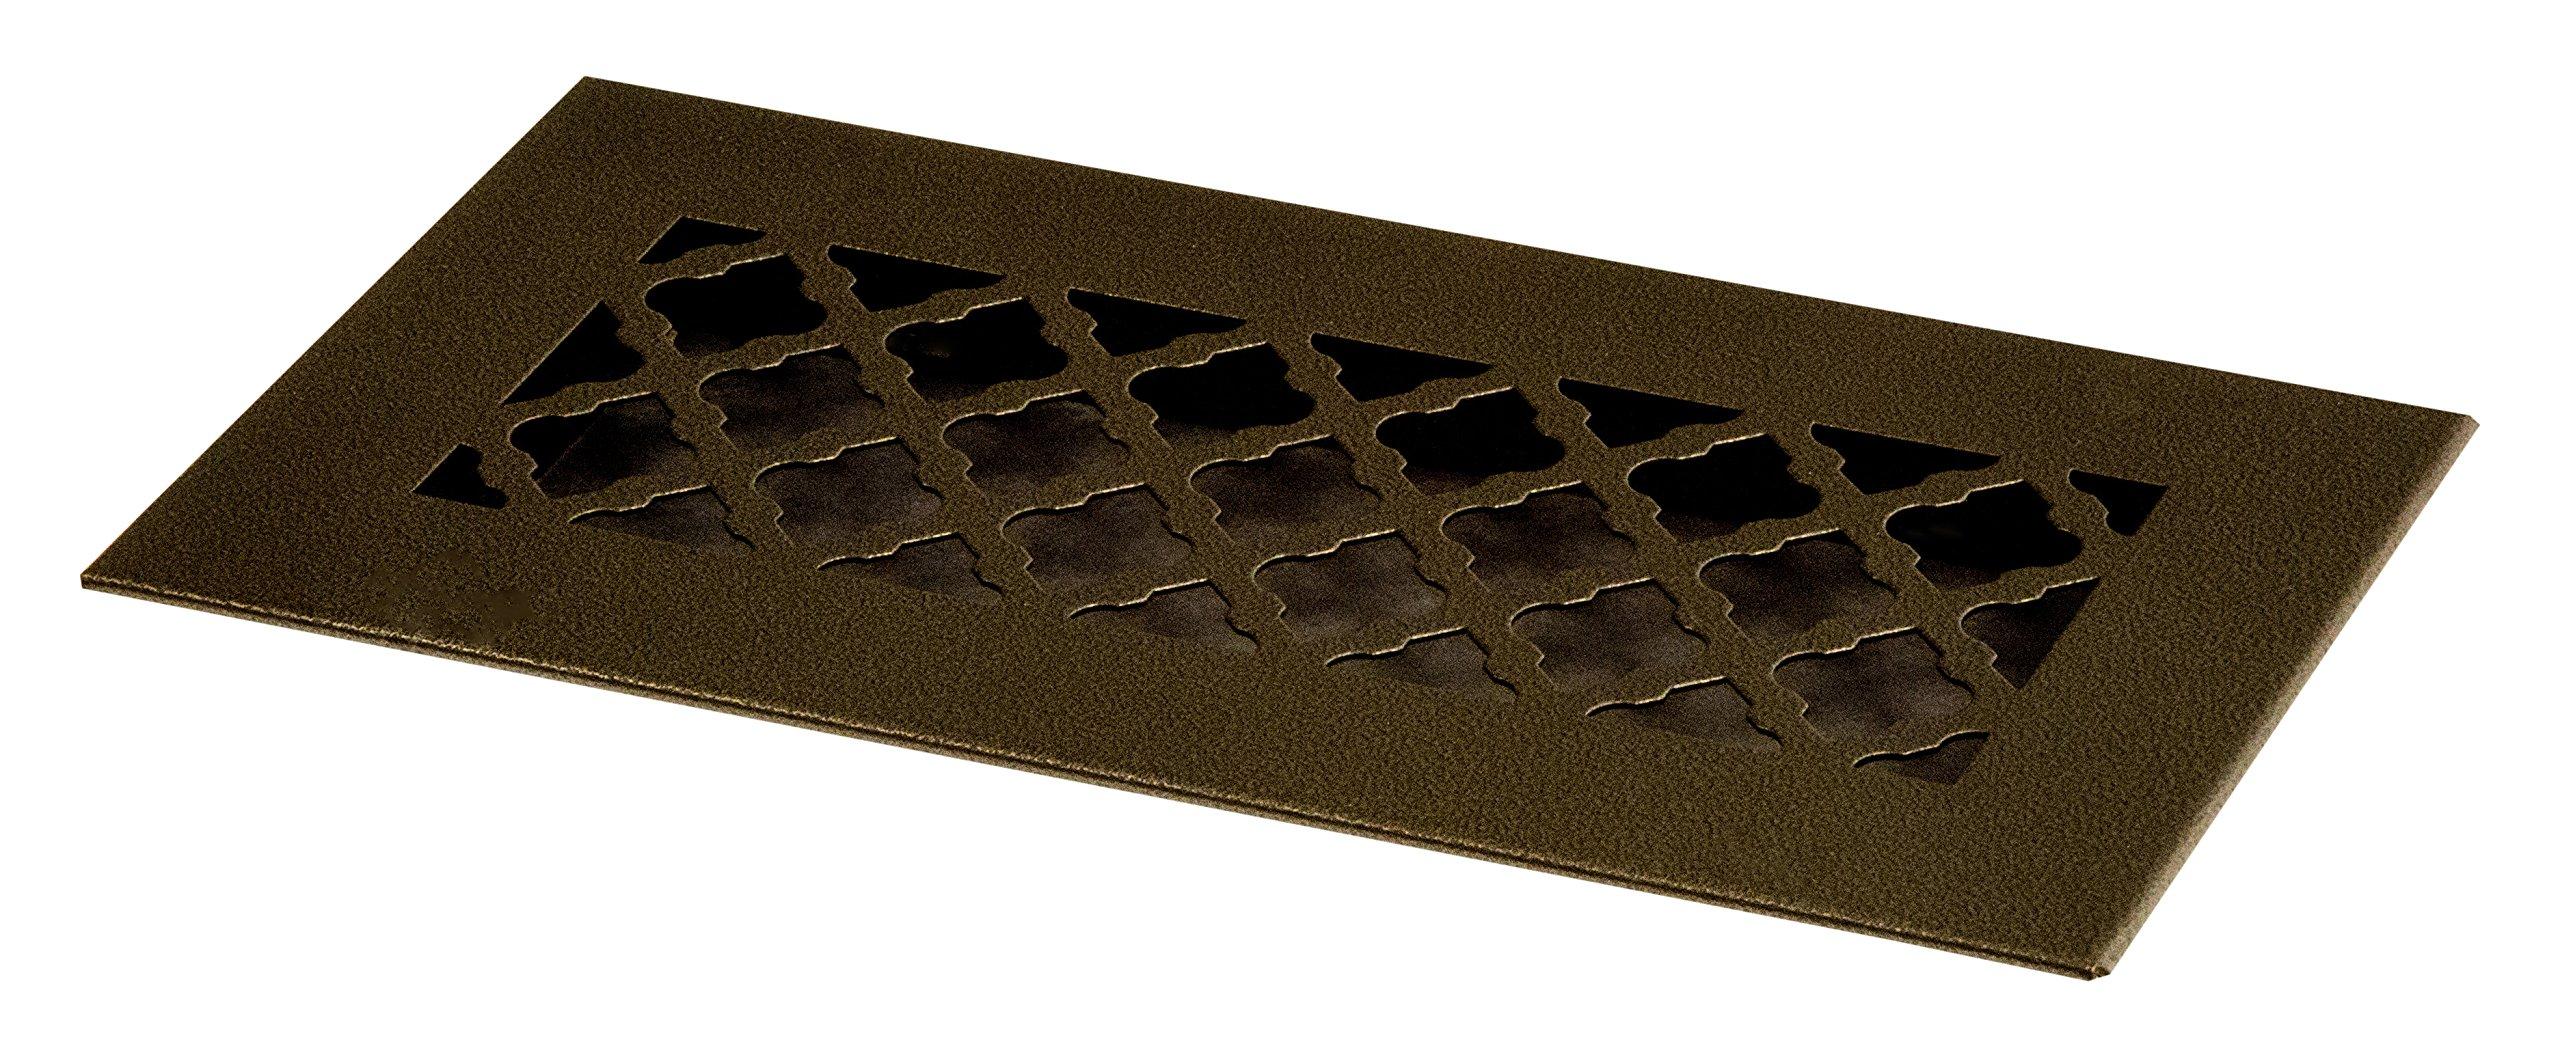 SteelCrest BTU10X4RORBN Bronze Series Designer Floor Vent Cover, Oil Rubbed Bronze by SteelCrest